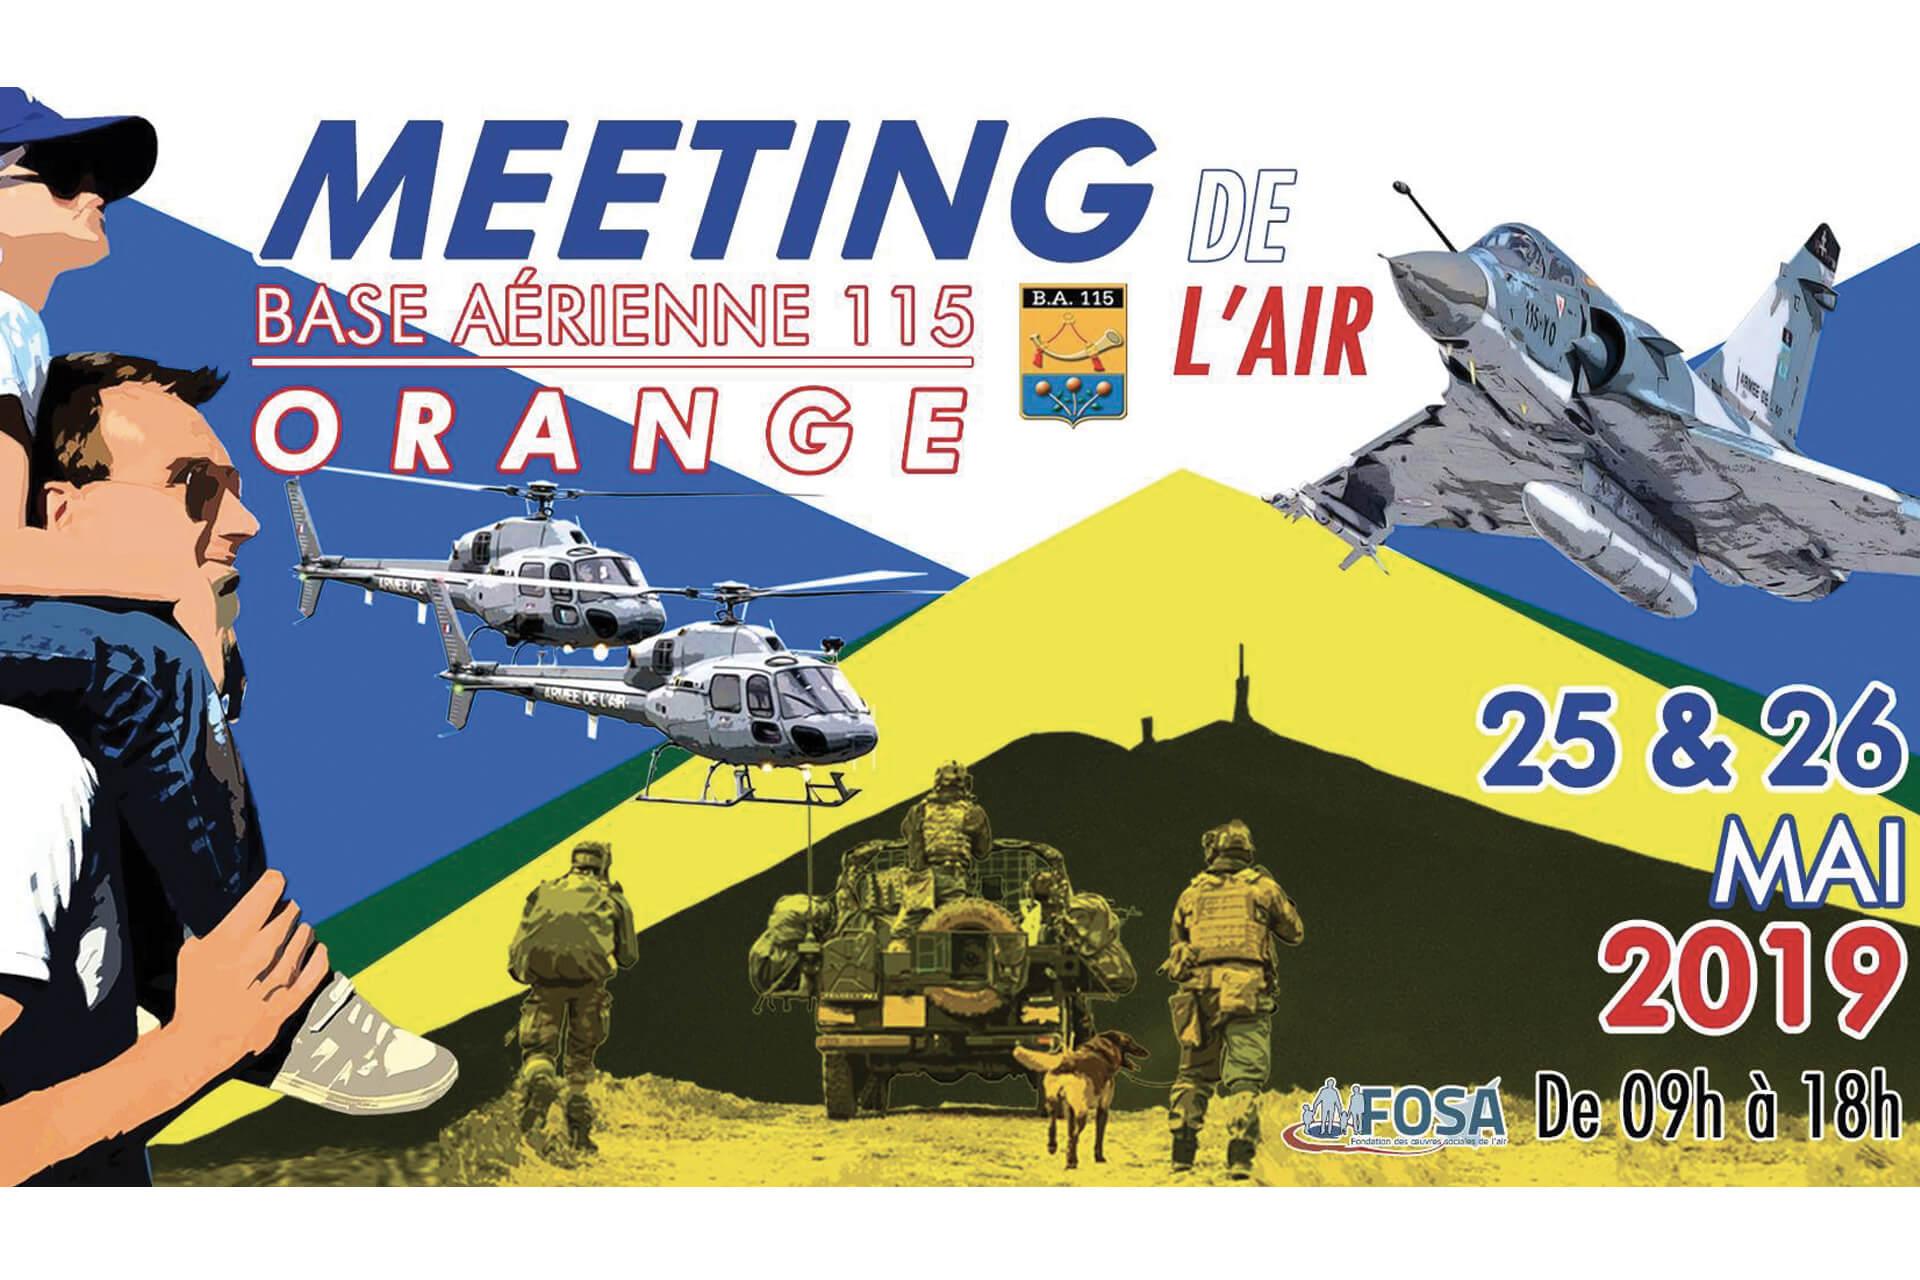 Meeting de l'Air – Orange